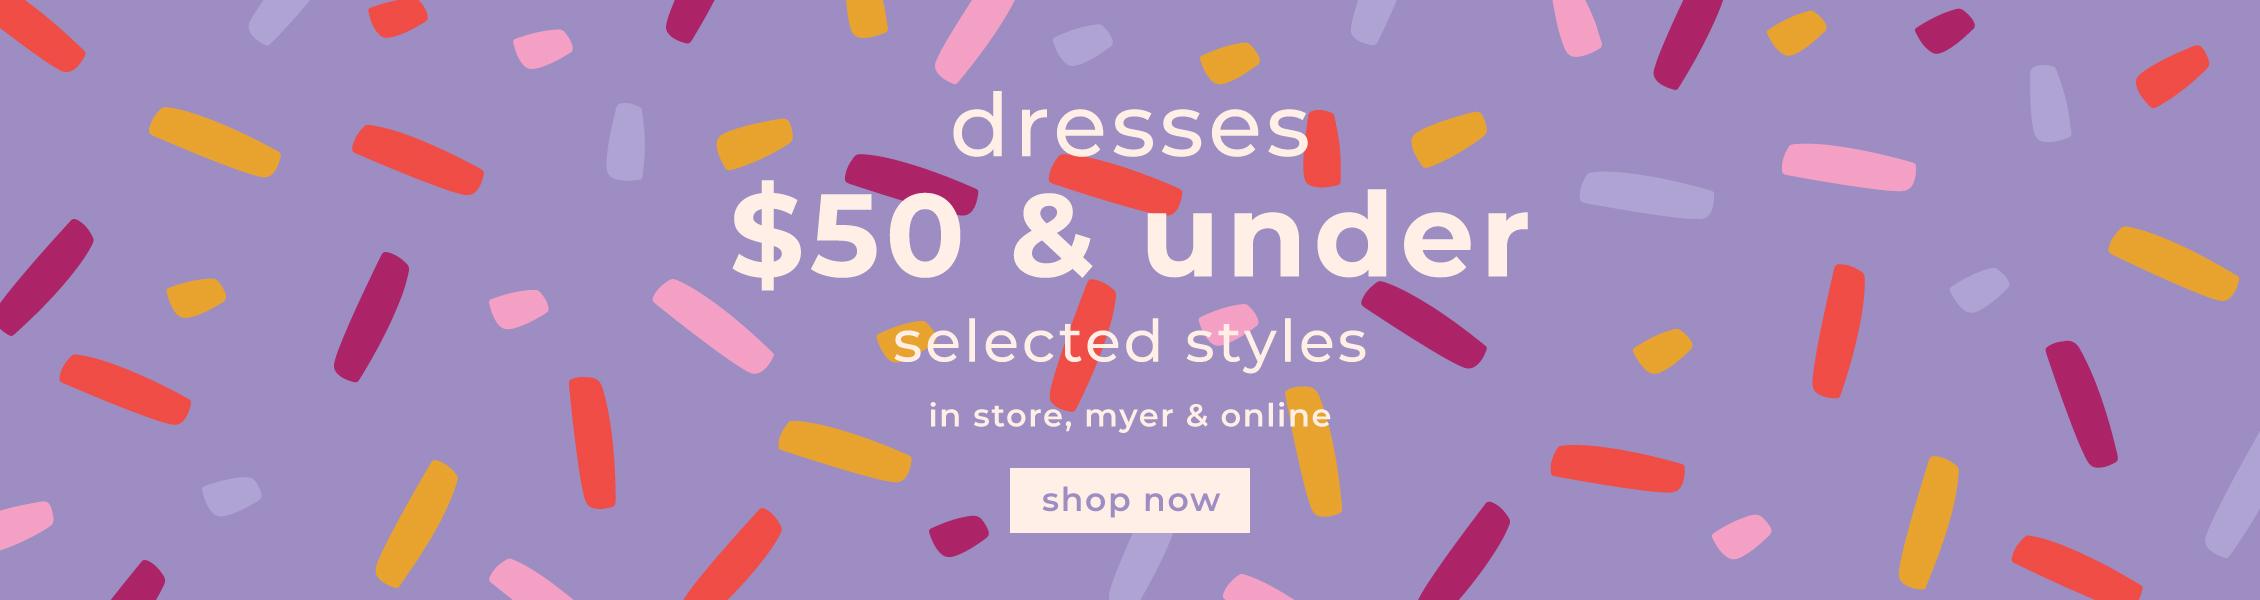 dresses $50 & under